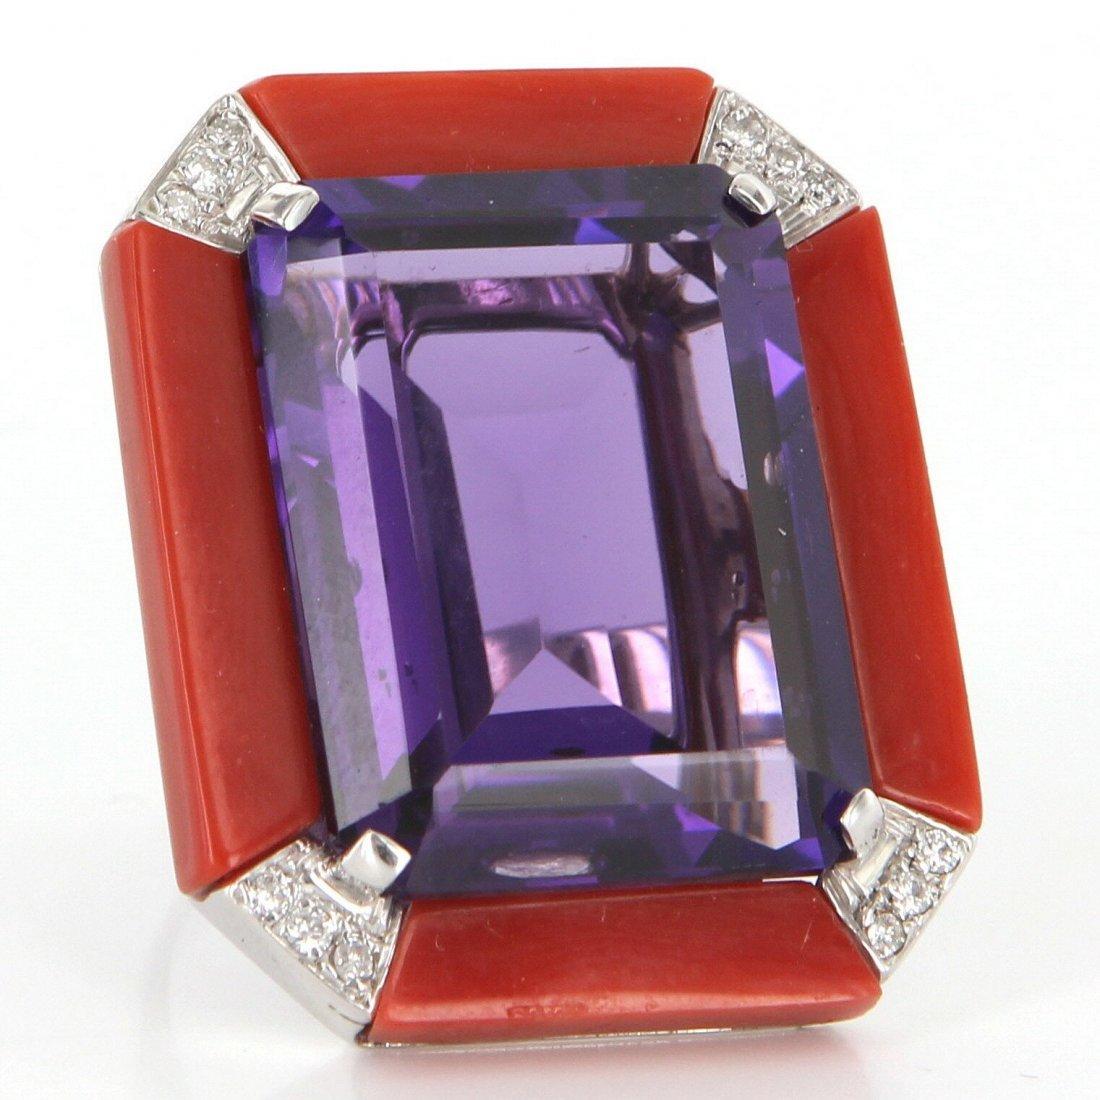 Vintage 18k White Gold Amethyst Red Coral Diamond Large